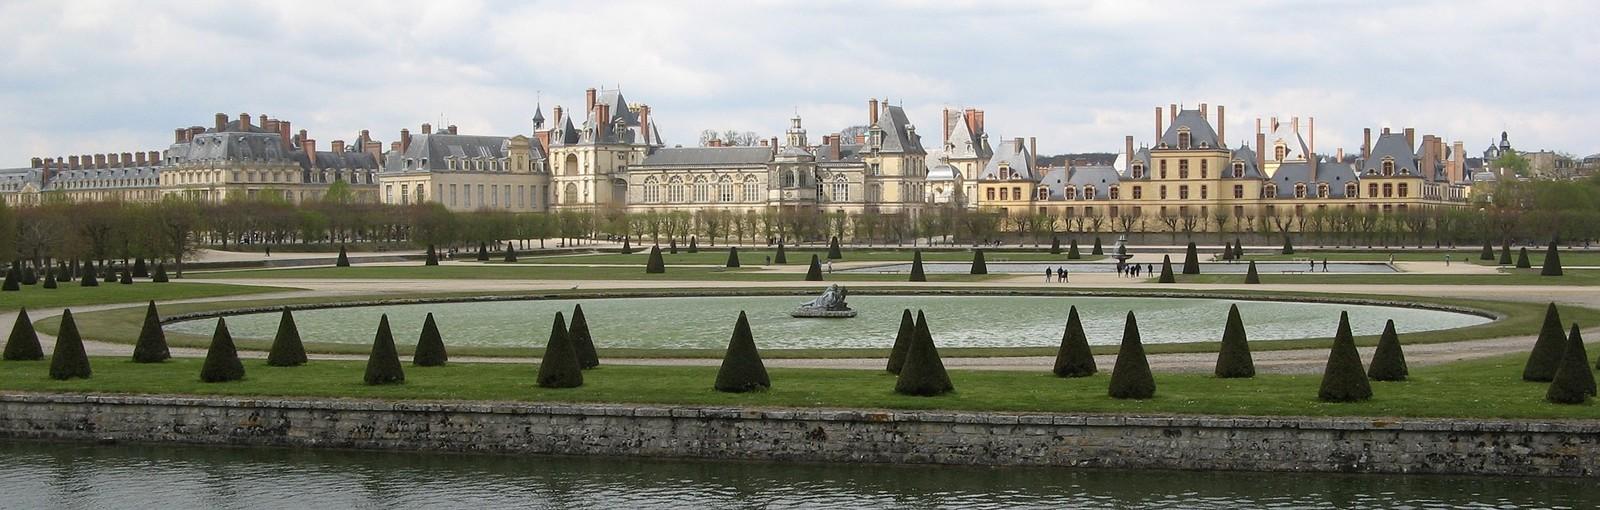 Tours Fontainebleau y Vaux-le-Vicomte - Días completos - Excursiones desde París